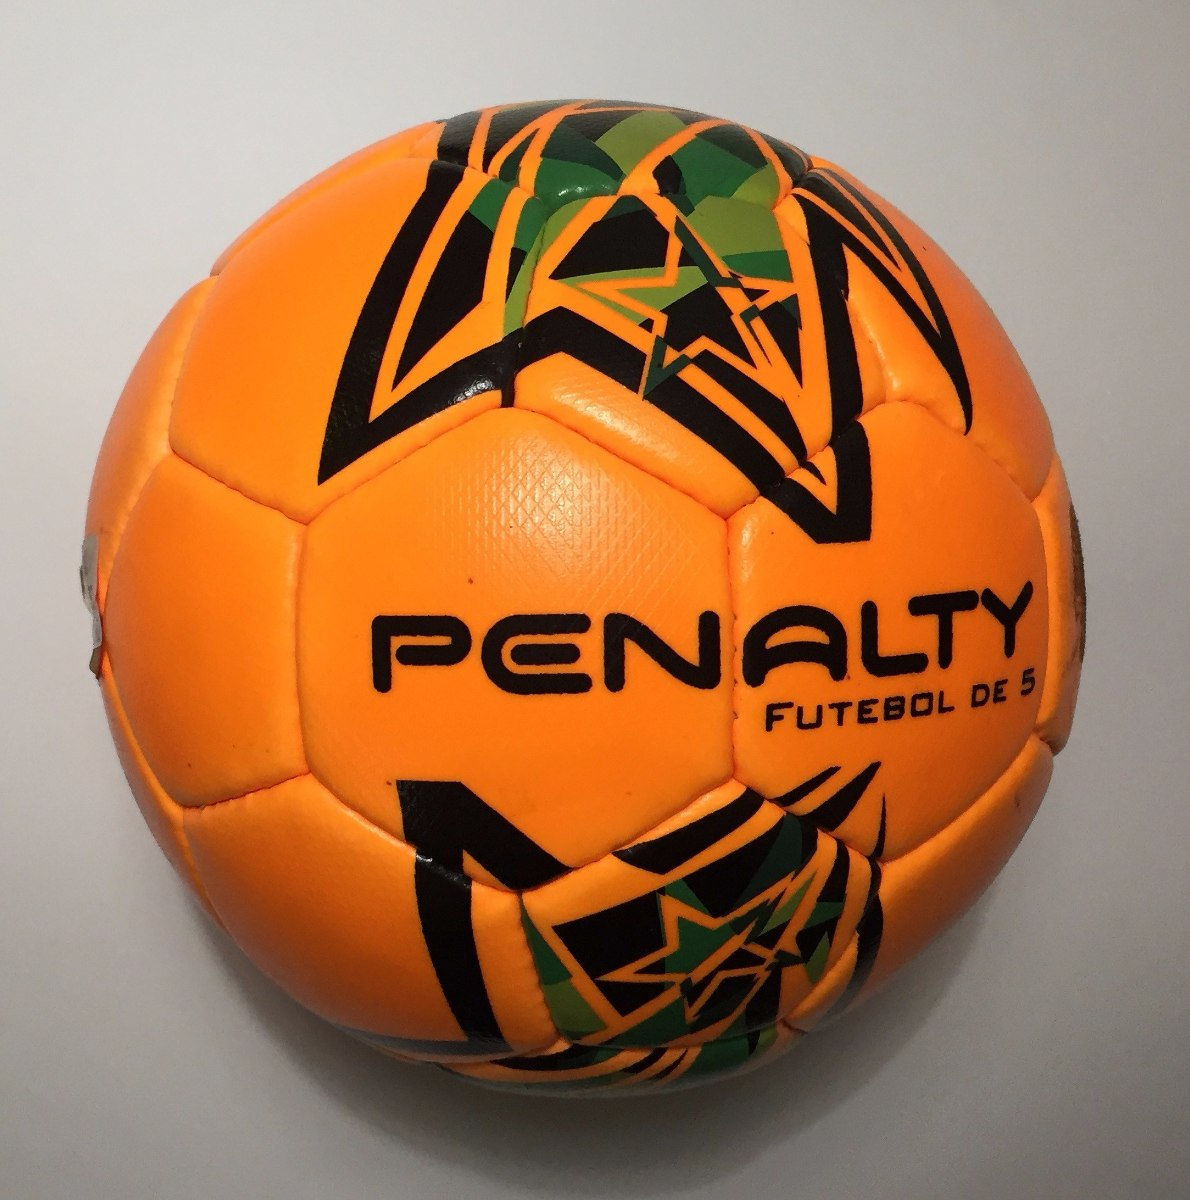 63ba7c099b bola penalty guizo 4 futsal - bola para futebol de 5. Carregando zoom.